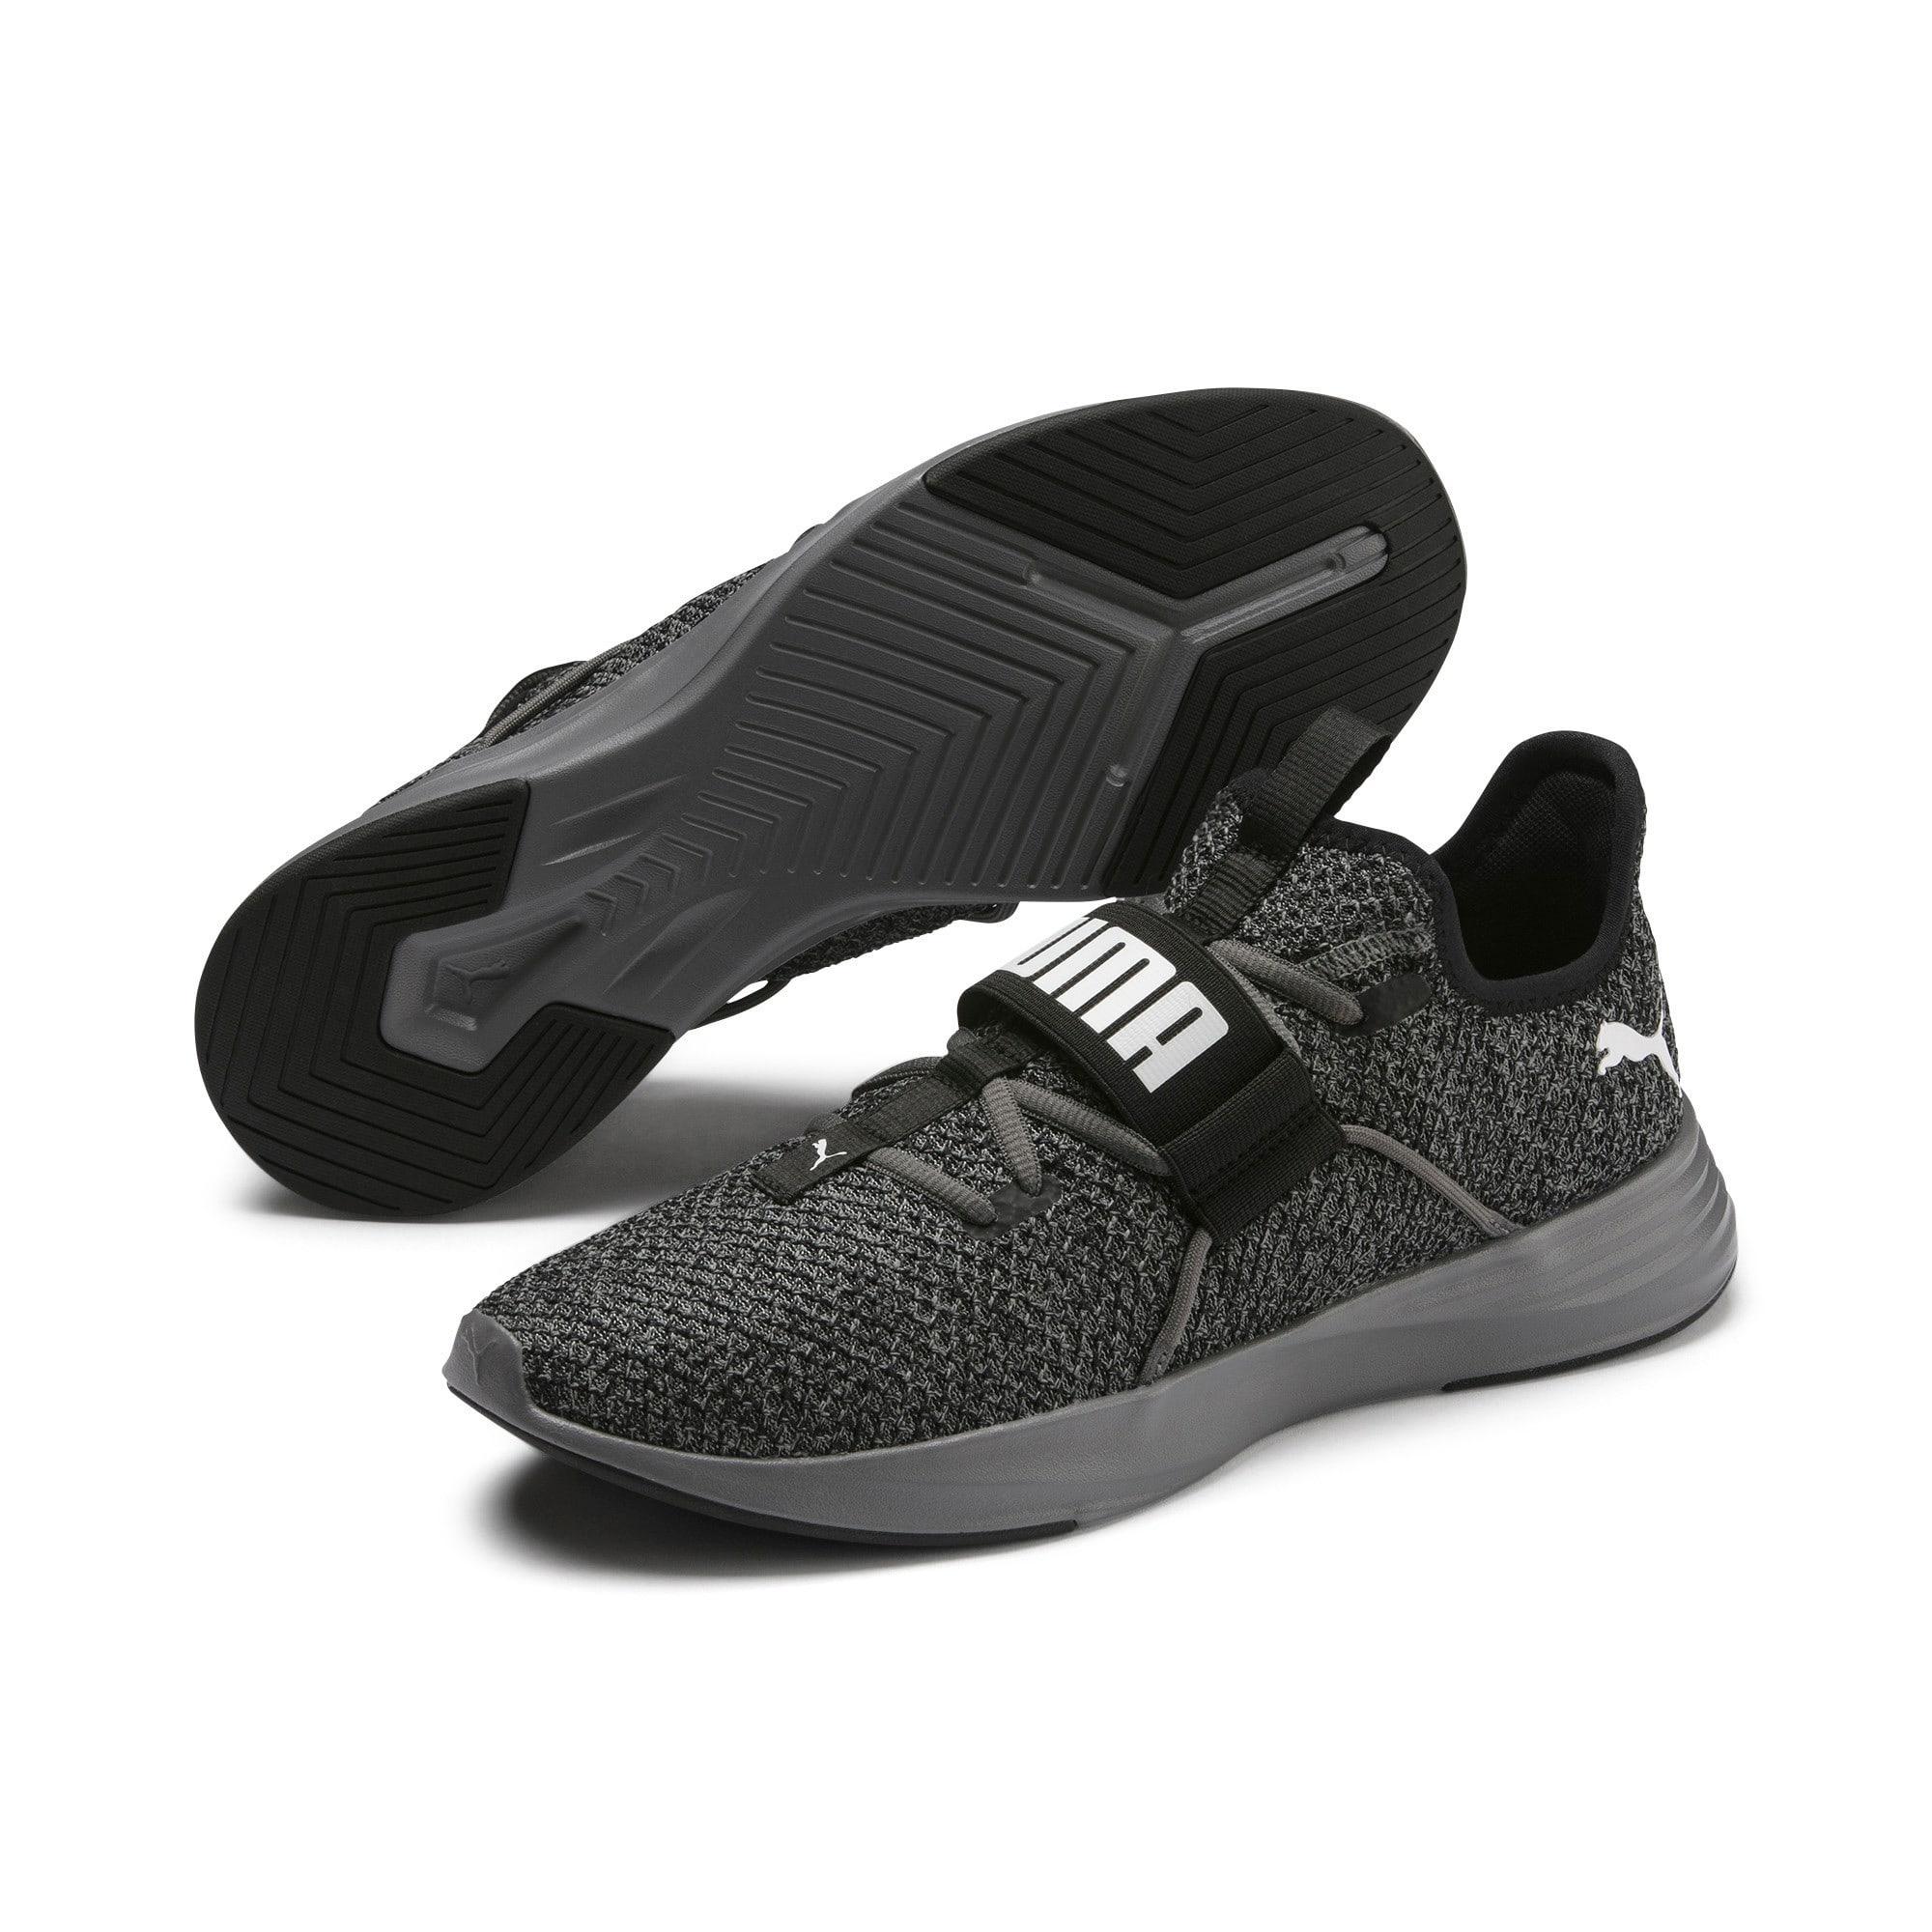 Thumbnail 3 of Persist XT Knit Men's Training Shoes, CASTLEROCK-Puma White, medium